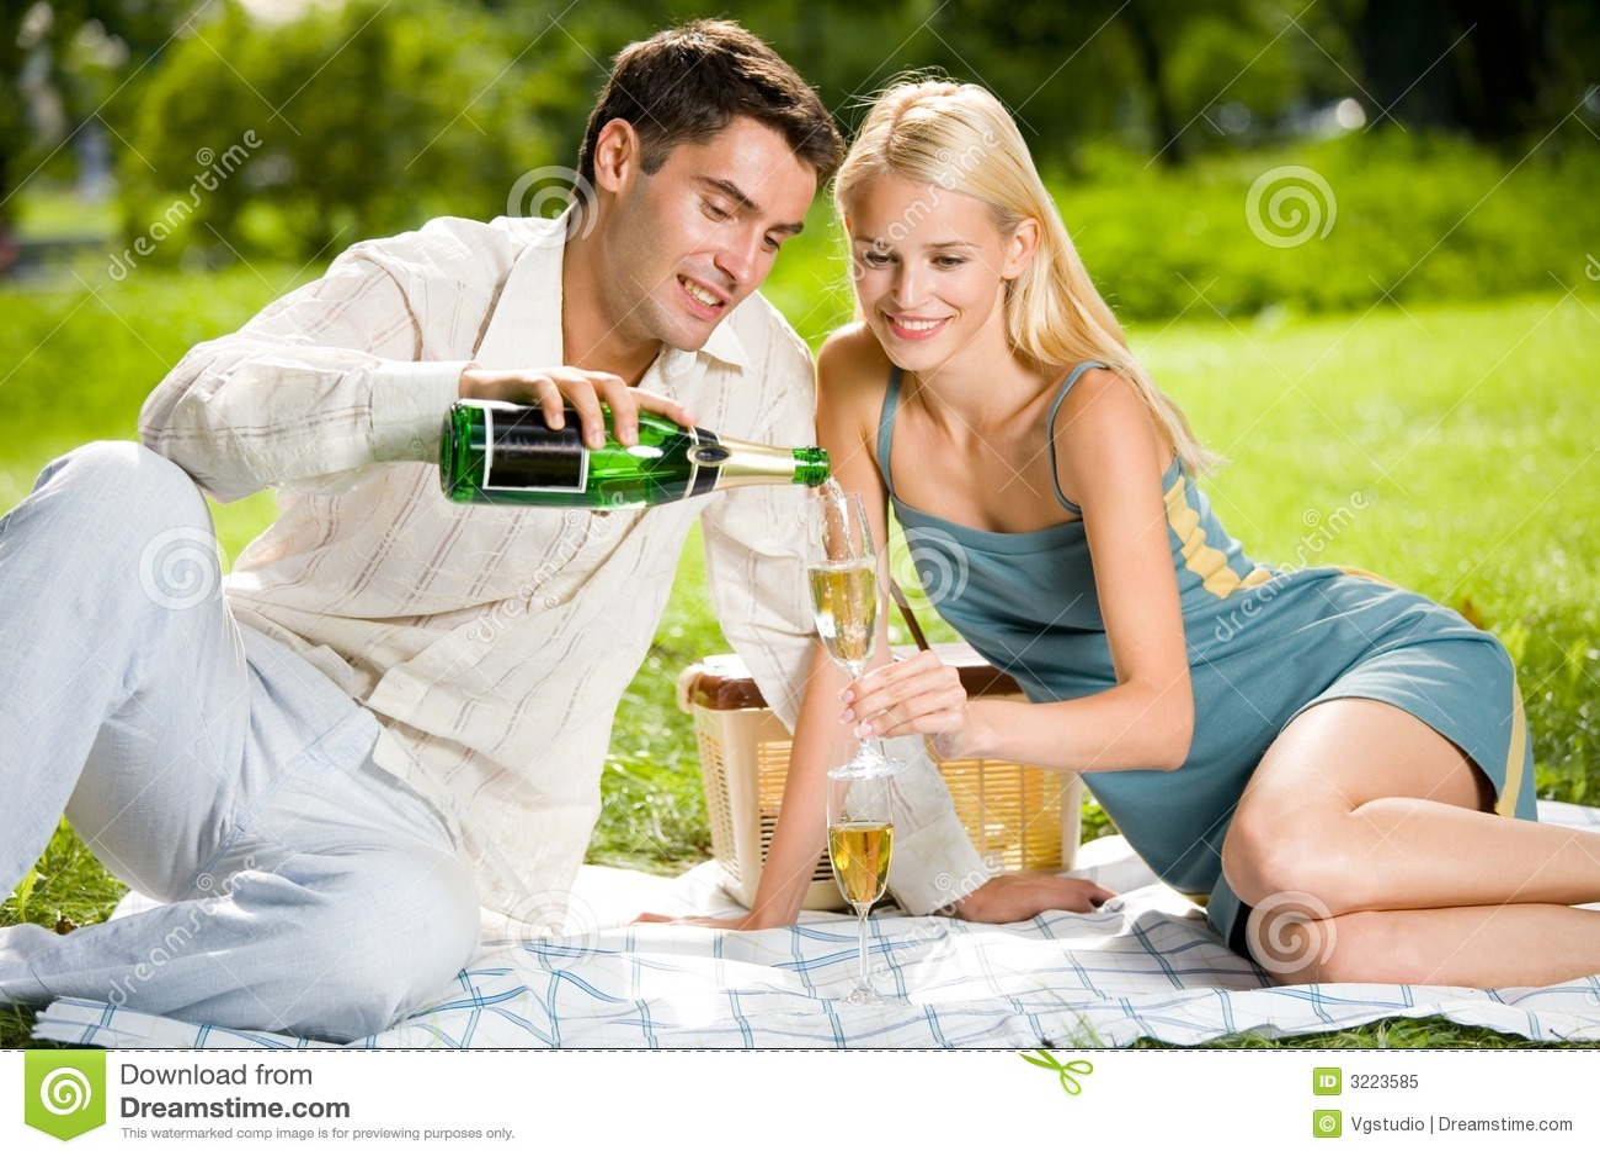 https://thumbs.dreamstime.com/z/happy-couple-celebrating-3223585.jpg